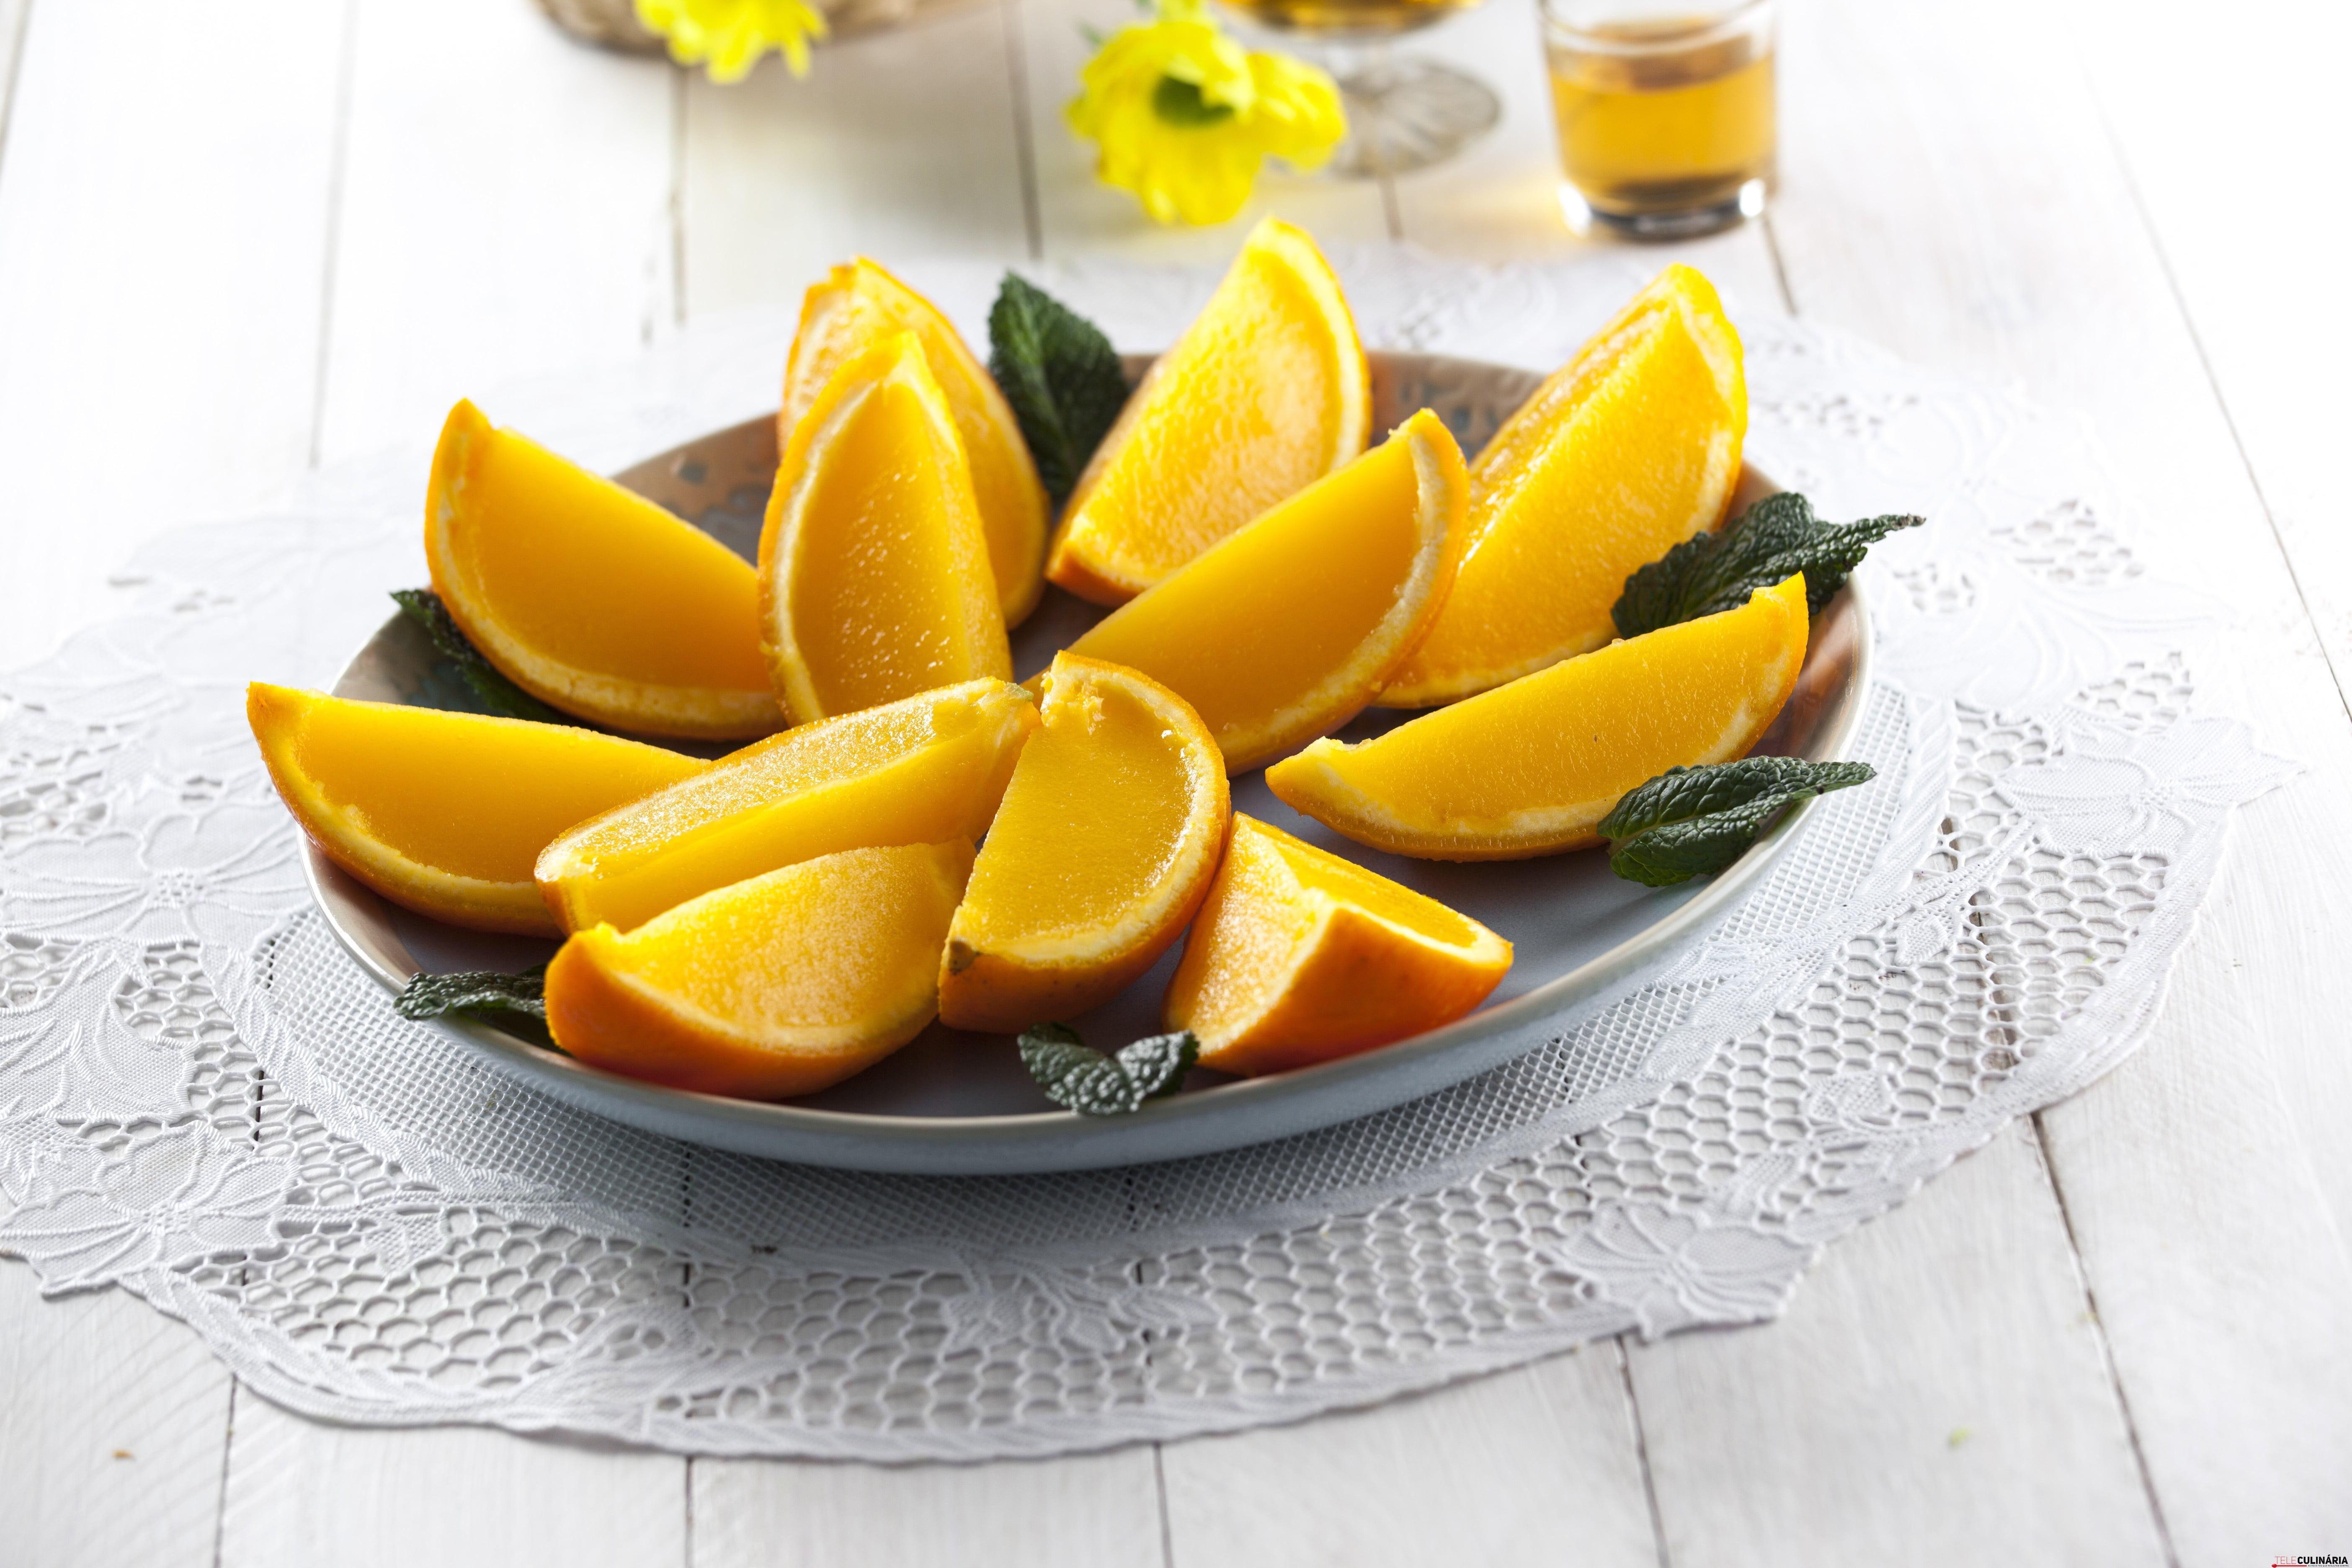 Gelatina de laranja na casca CHAA 5